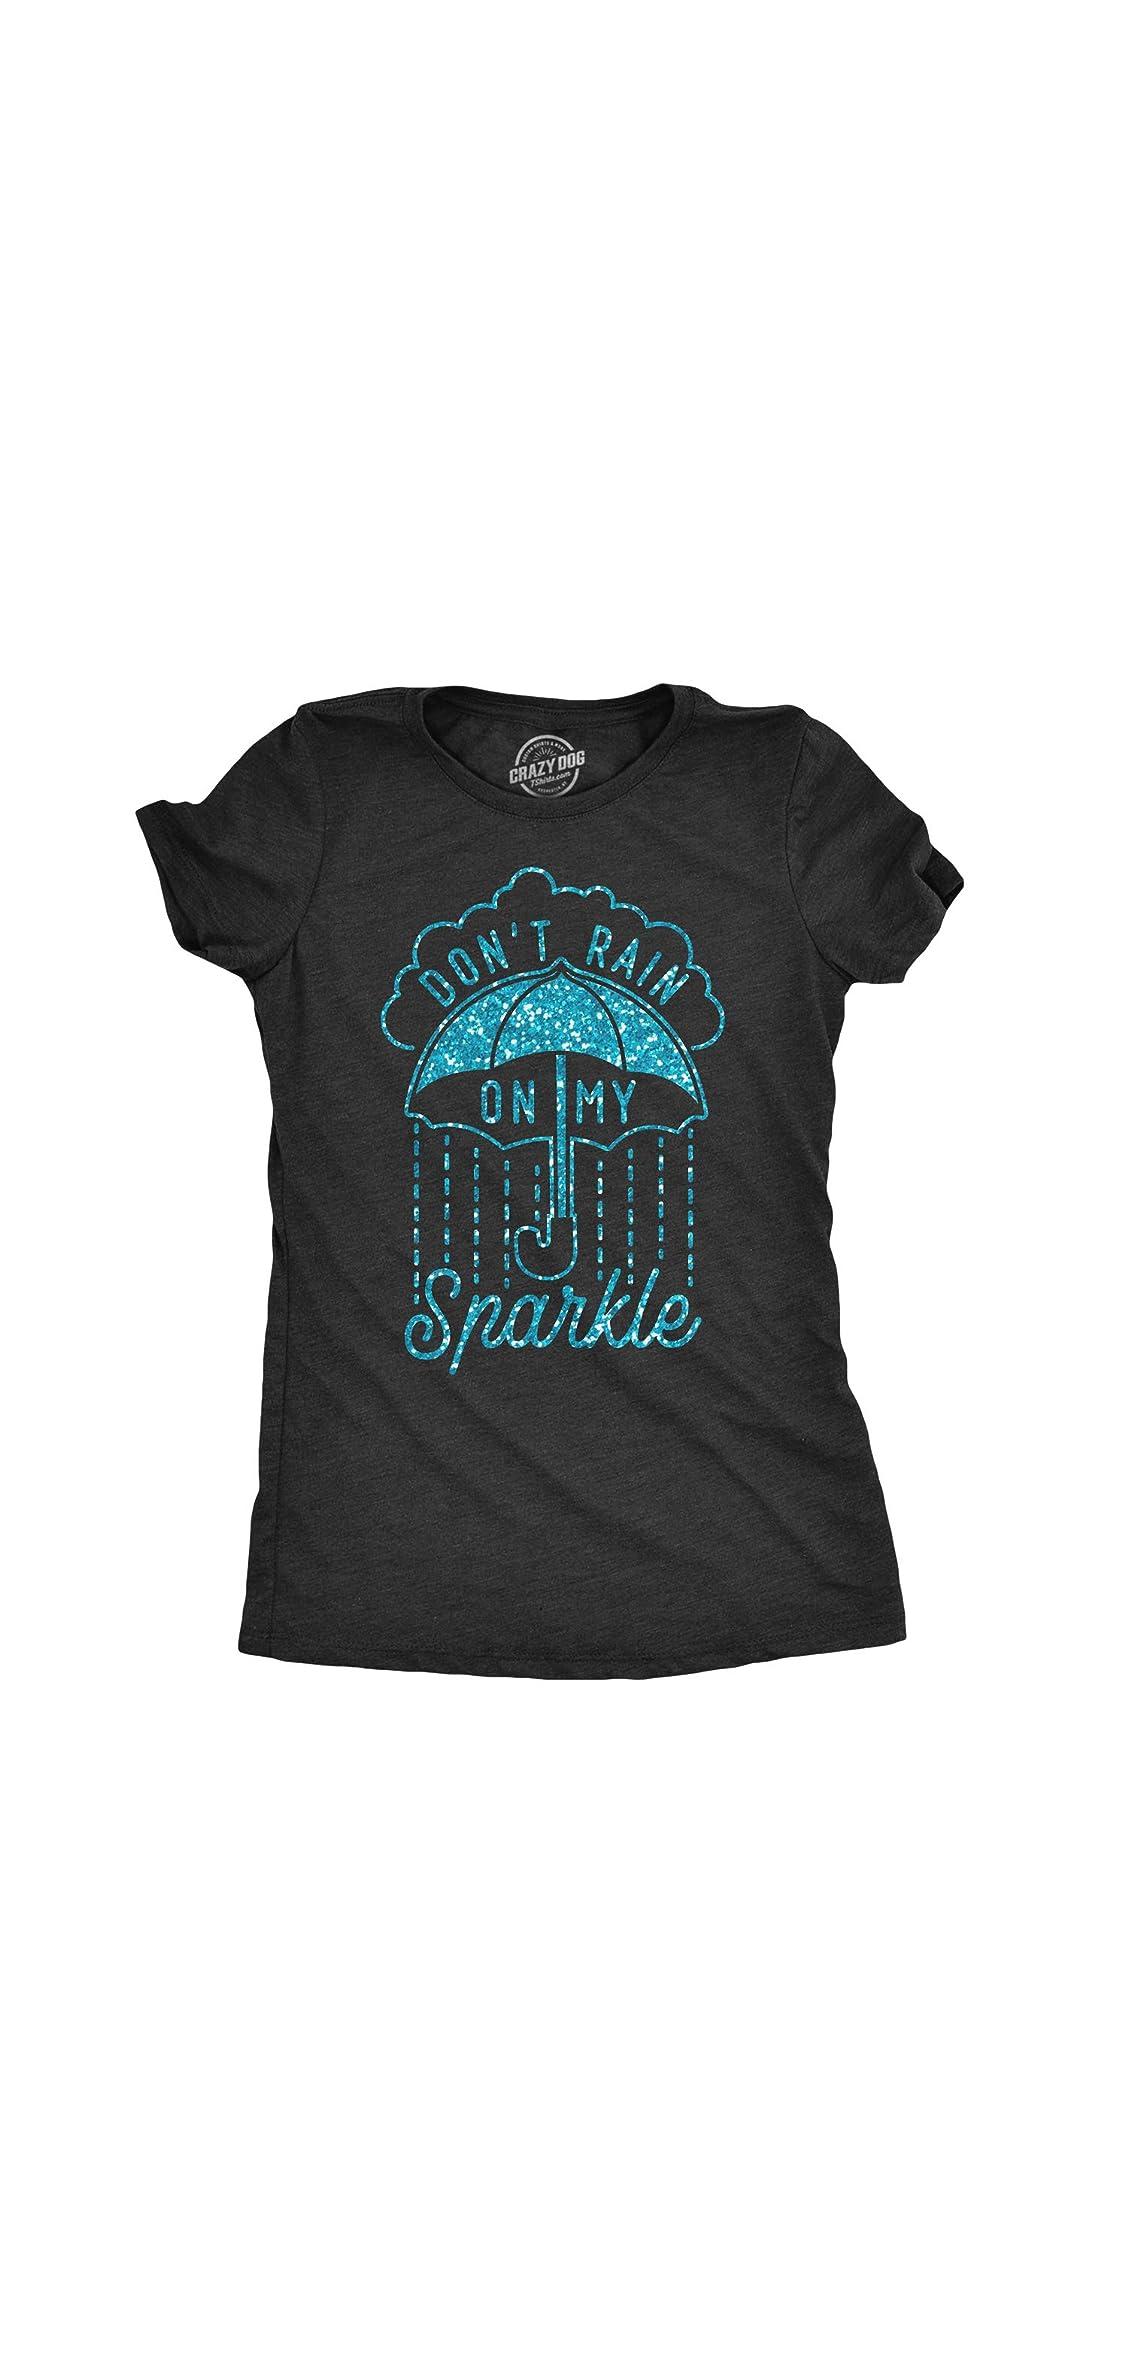 Womens Don't Rain On My Sparkle Parade Tshirt Funny Blue Glitter